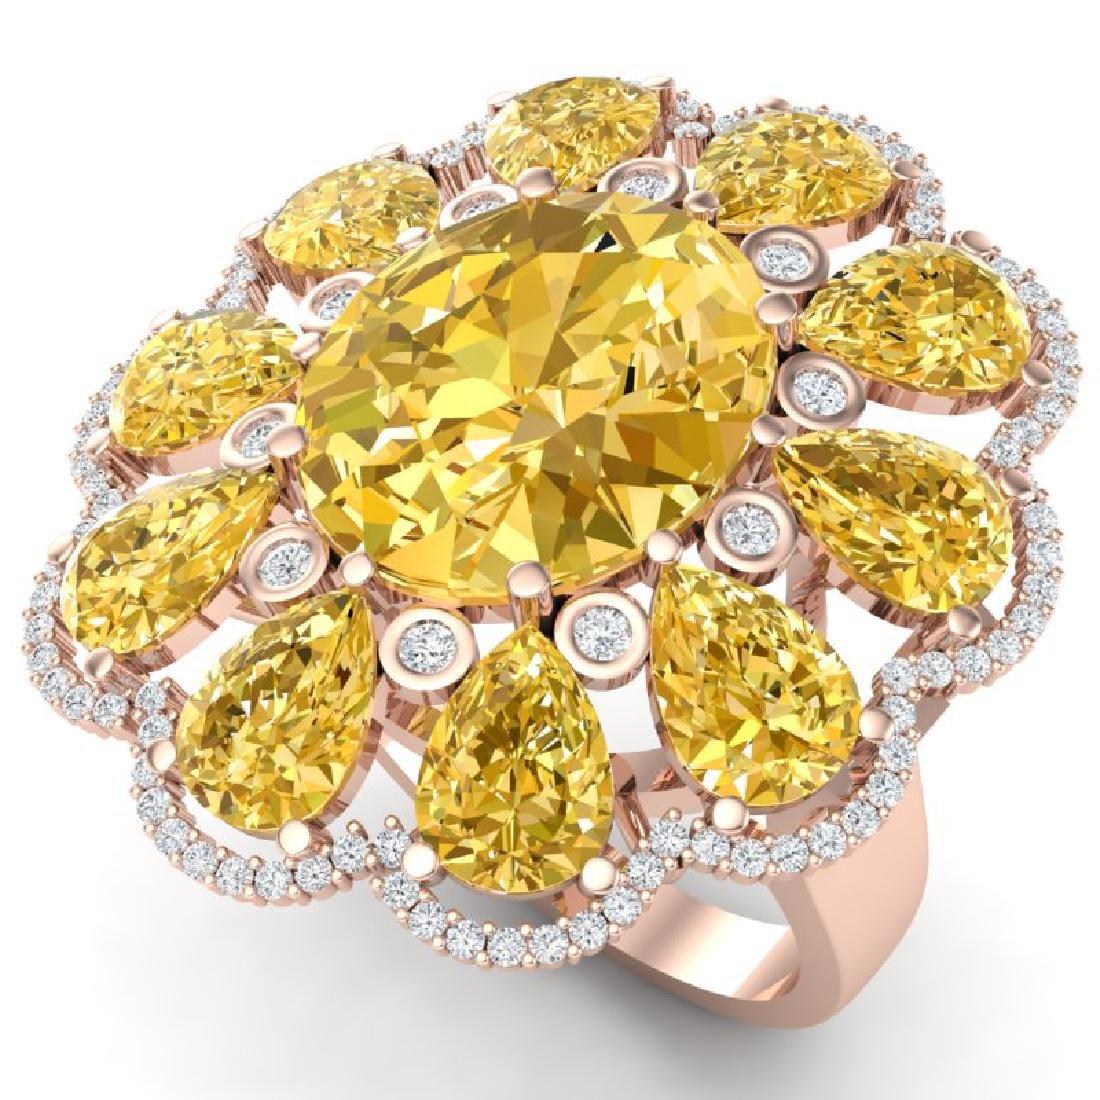 18.53 CTW Royalty Canary Citrine & VS Diamond Ring 18K